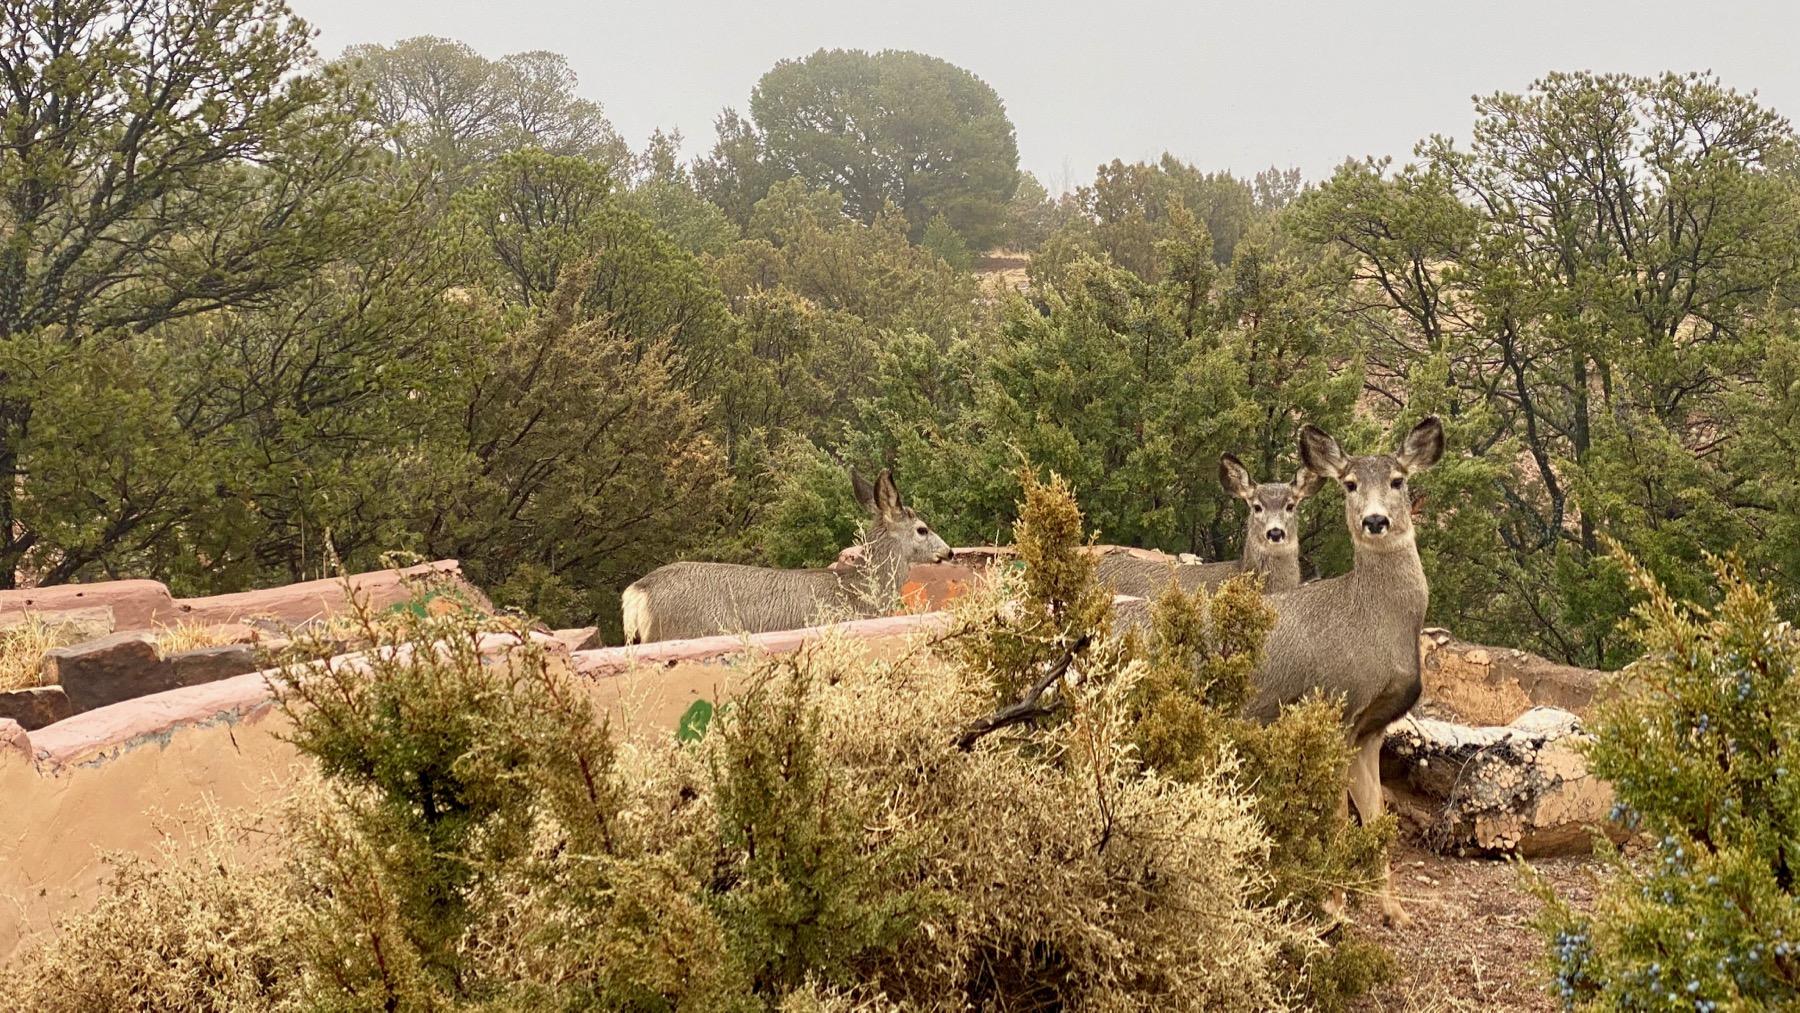 Deer marcy hill